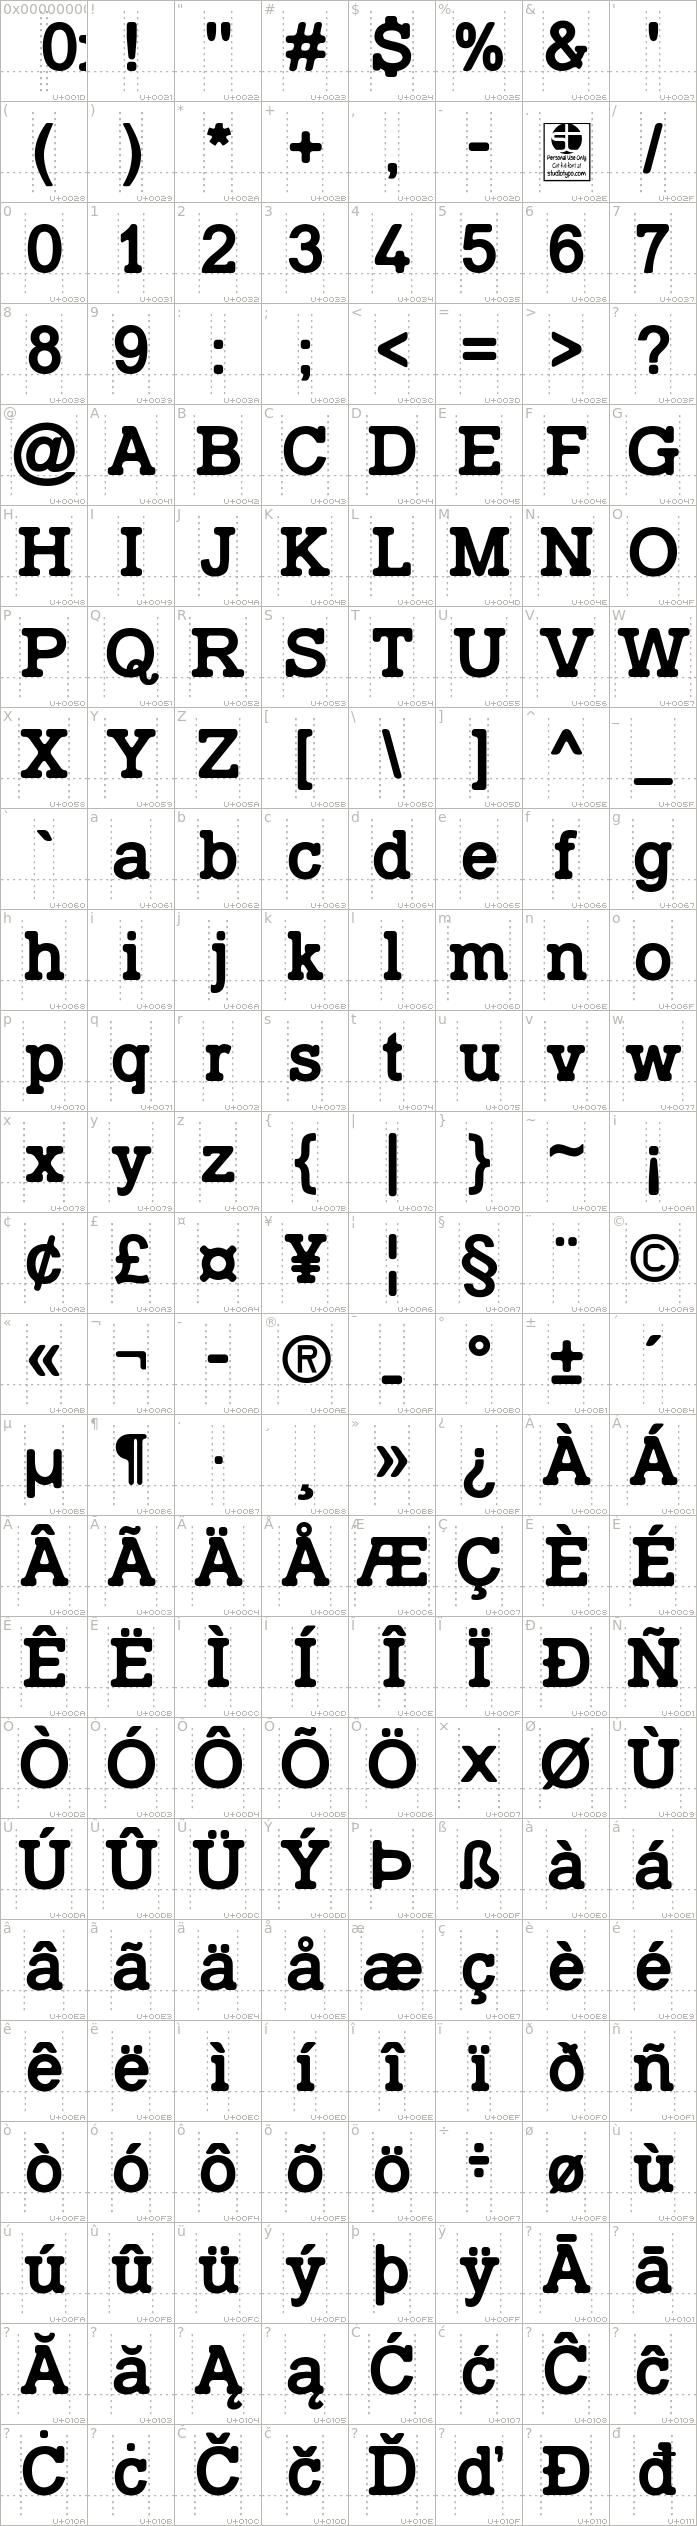 typoslab-irregular.demo.character-map-1